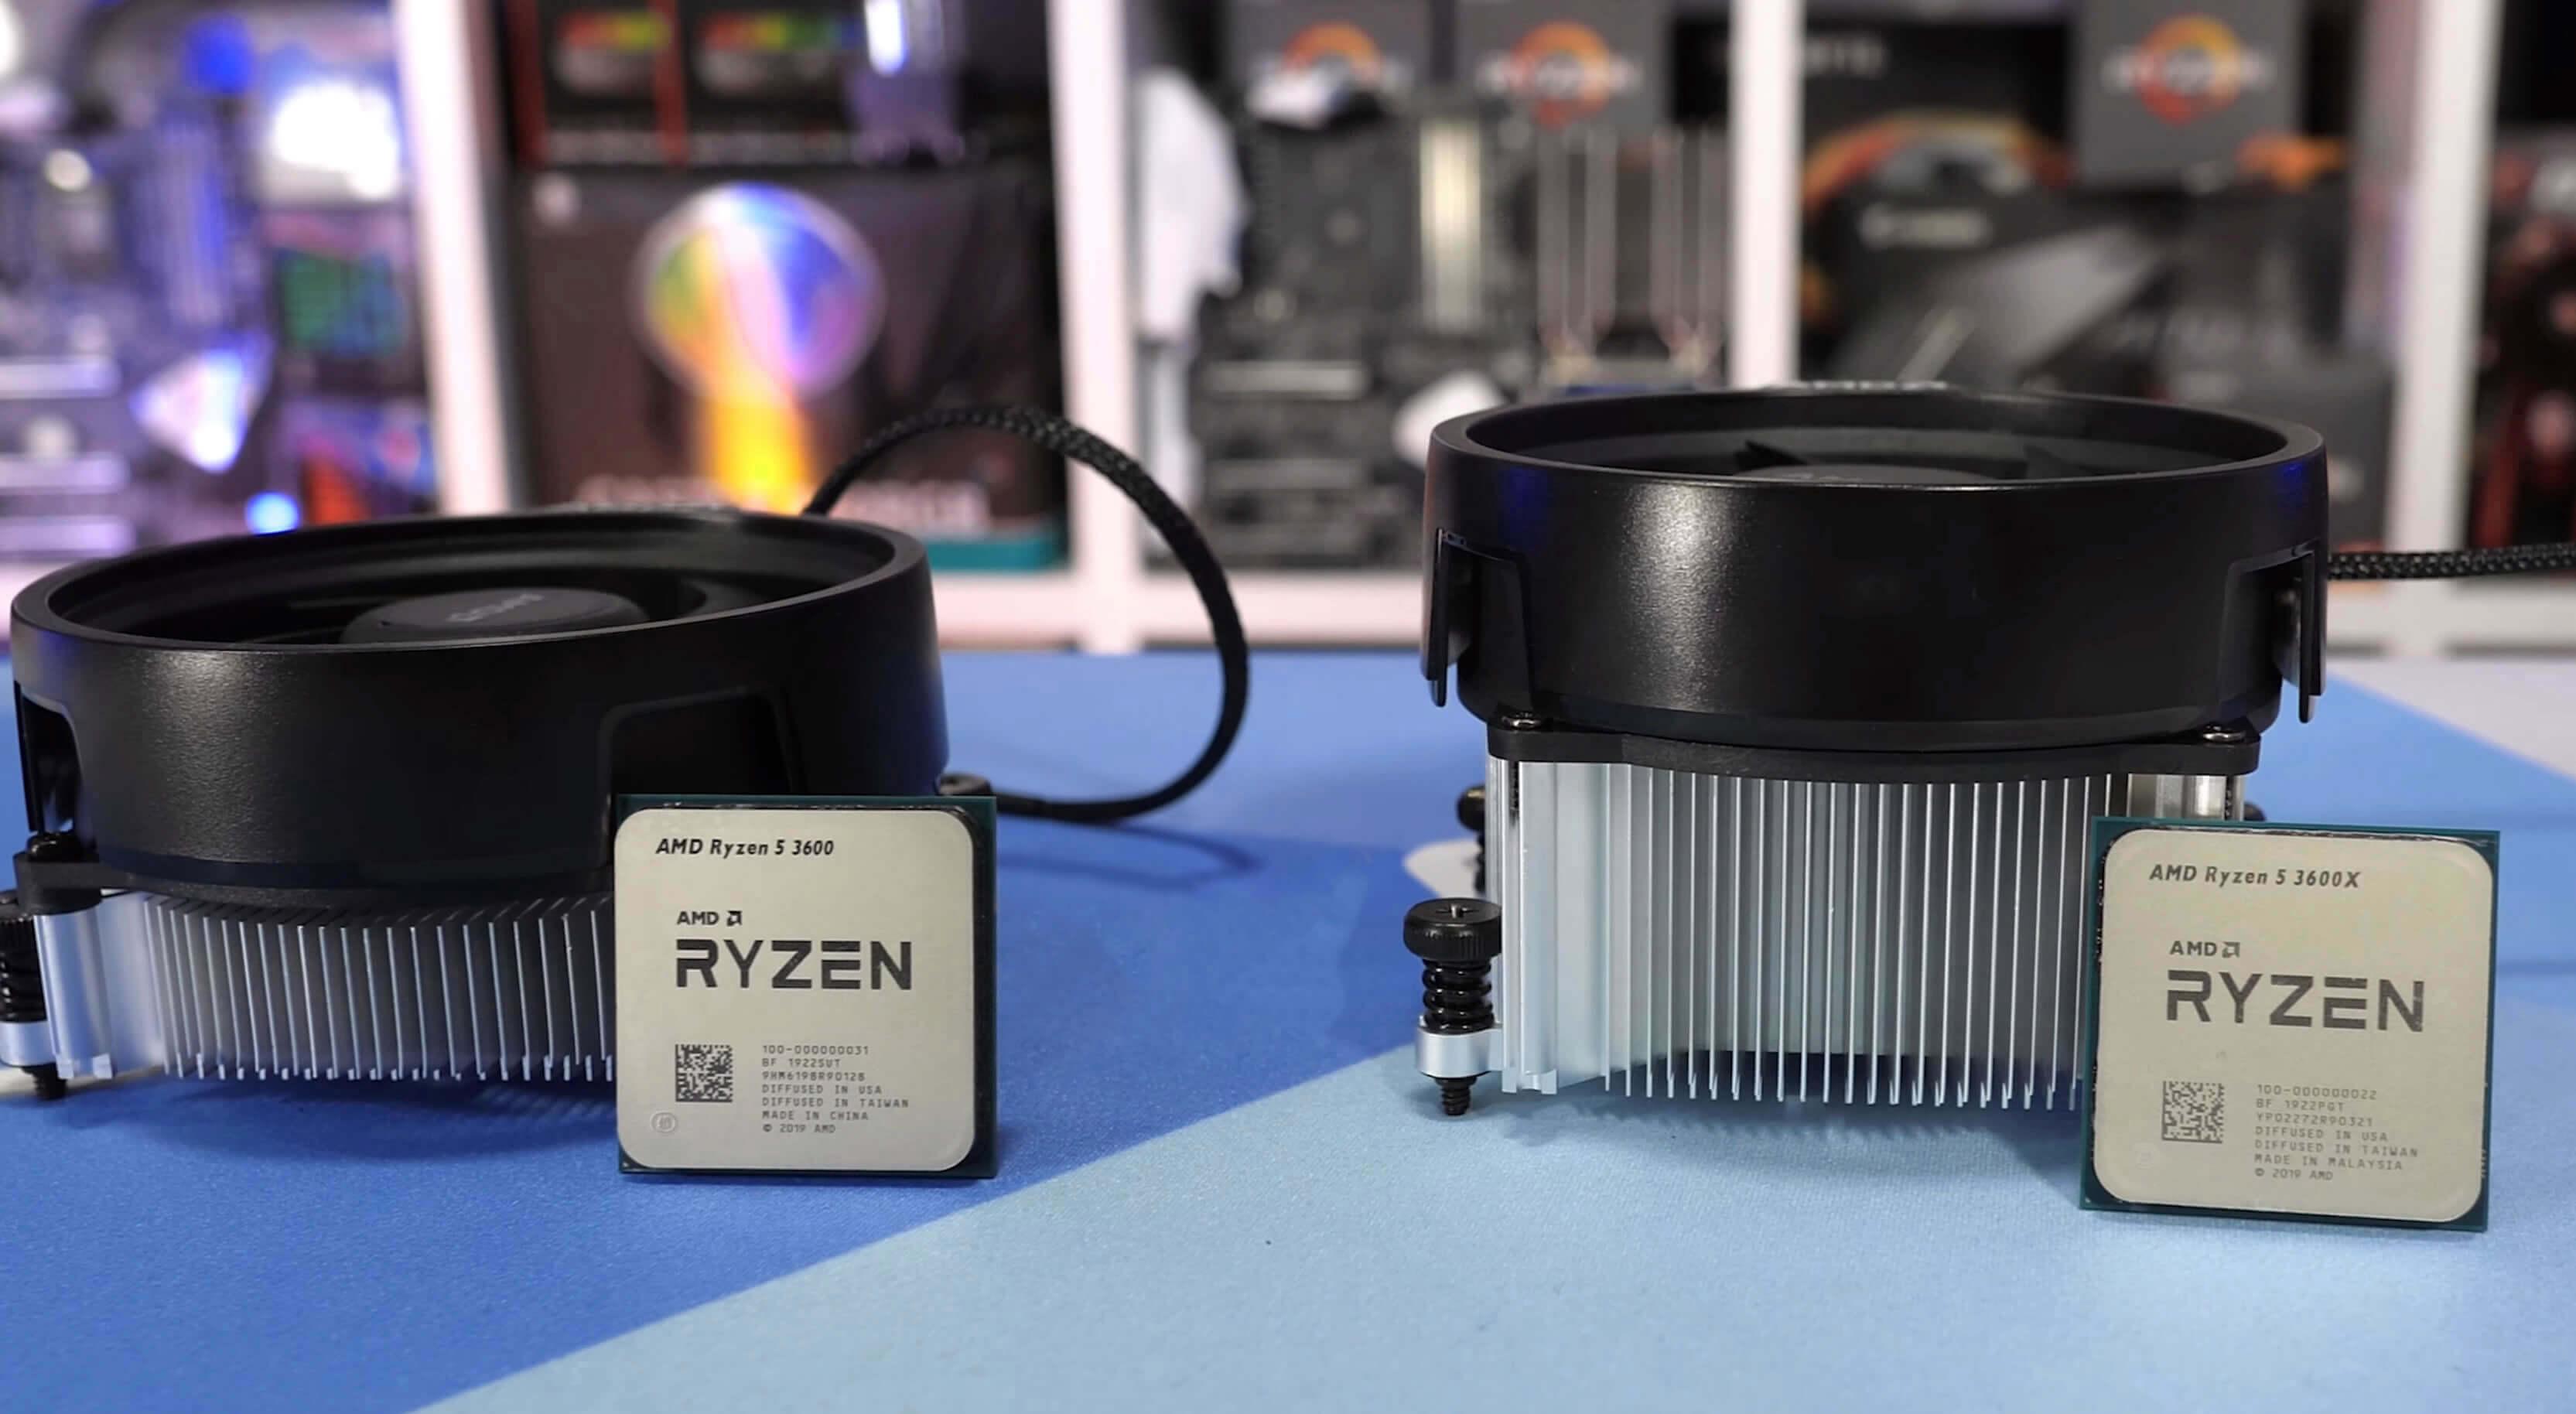 Ryzen 5 3600 Vs 3600x Which Should You Buy